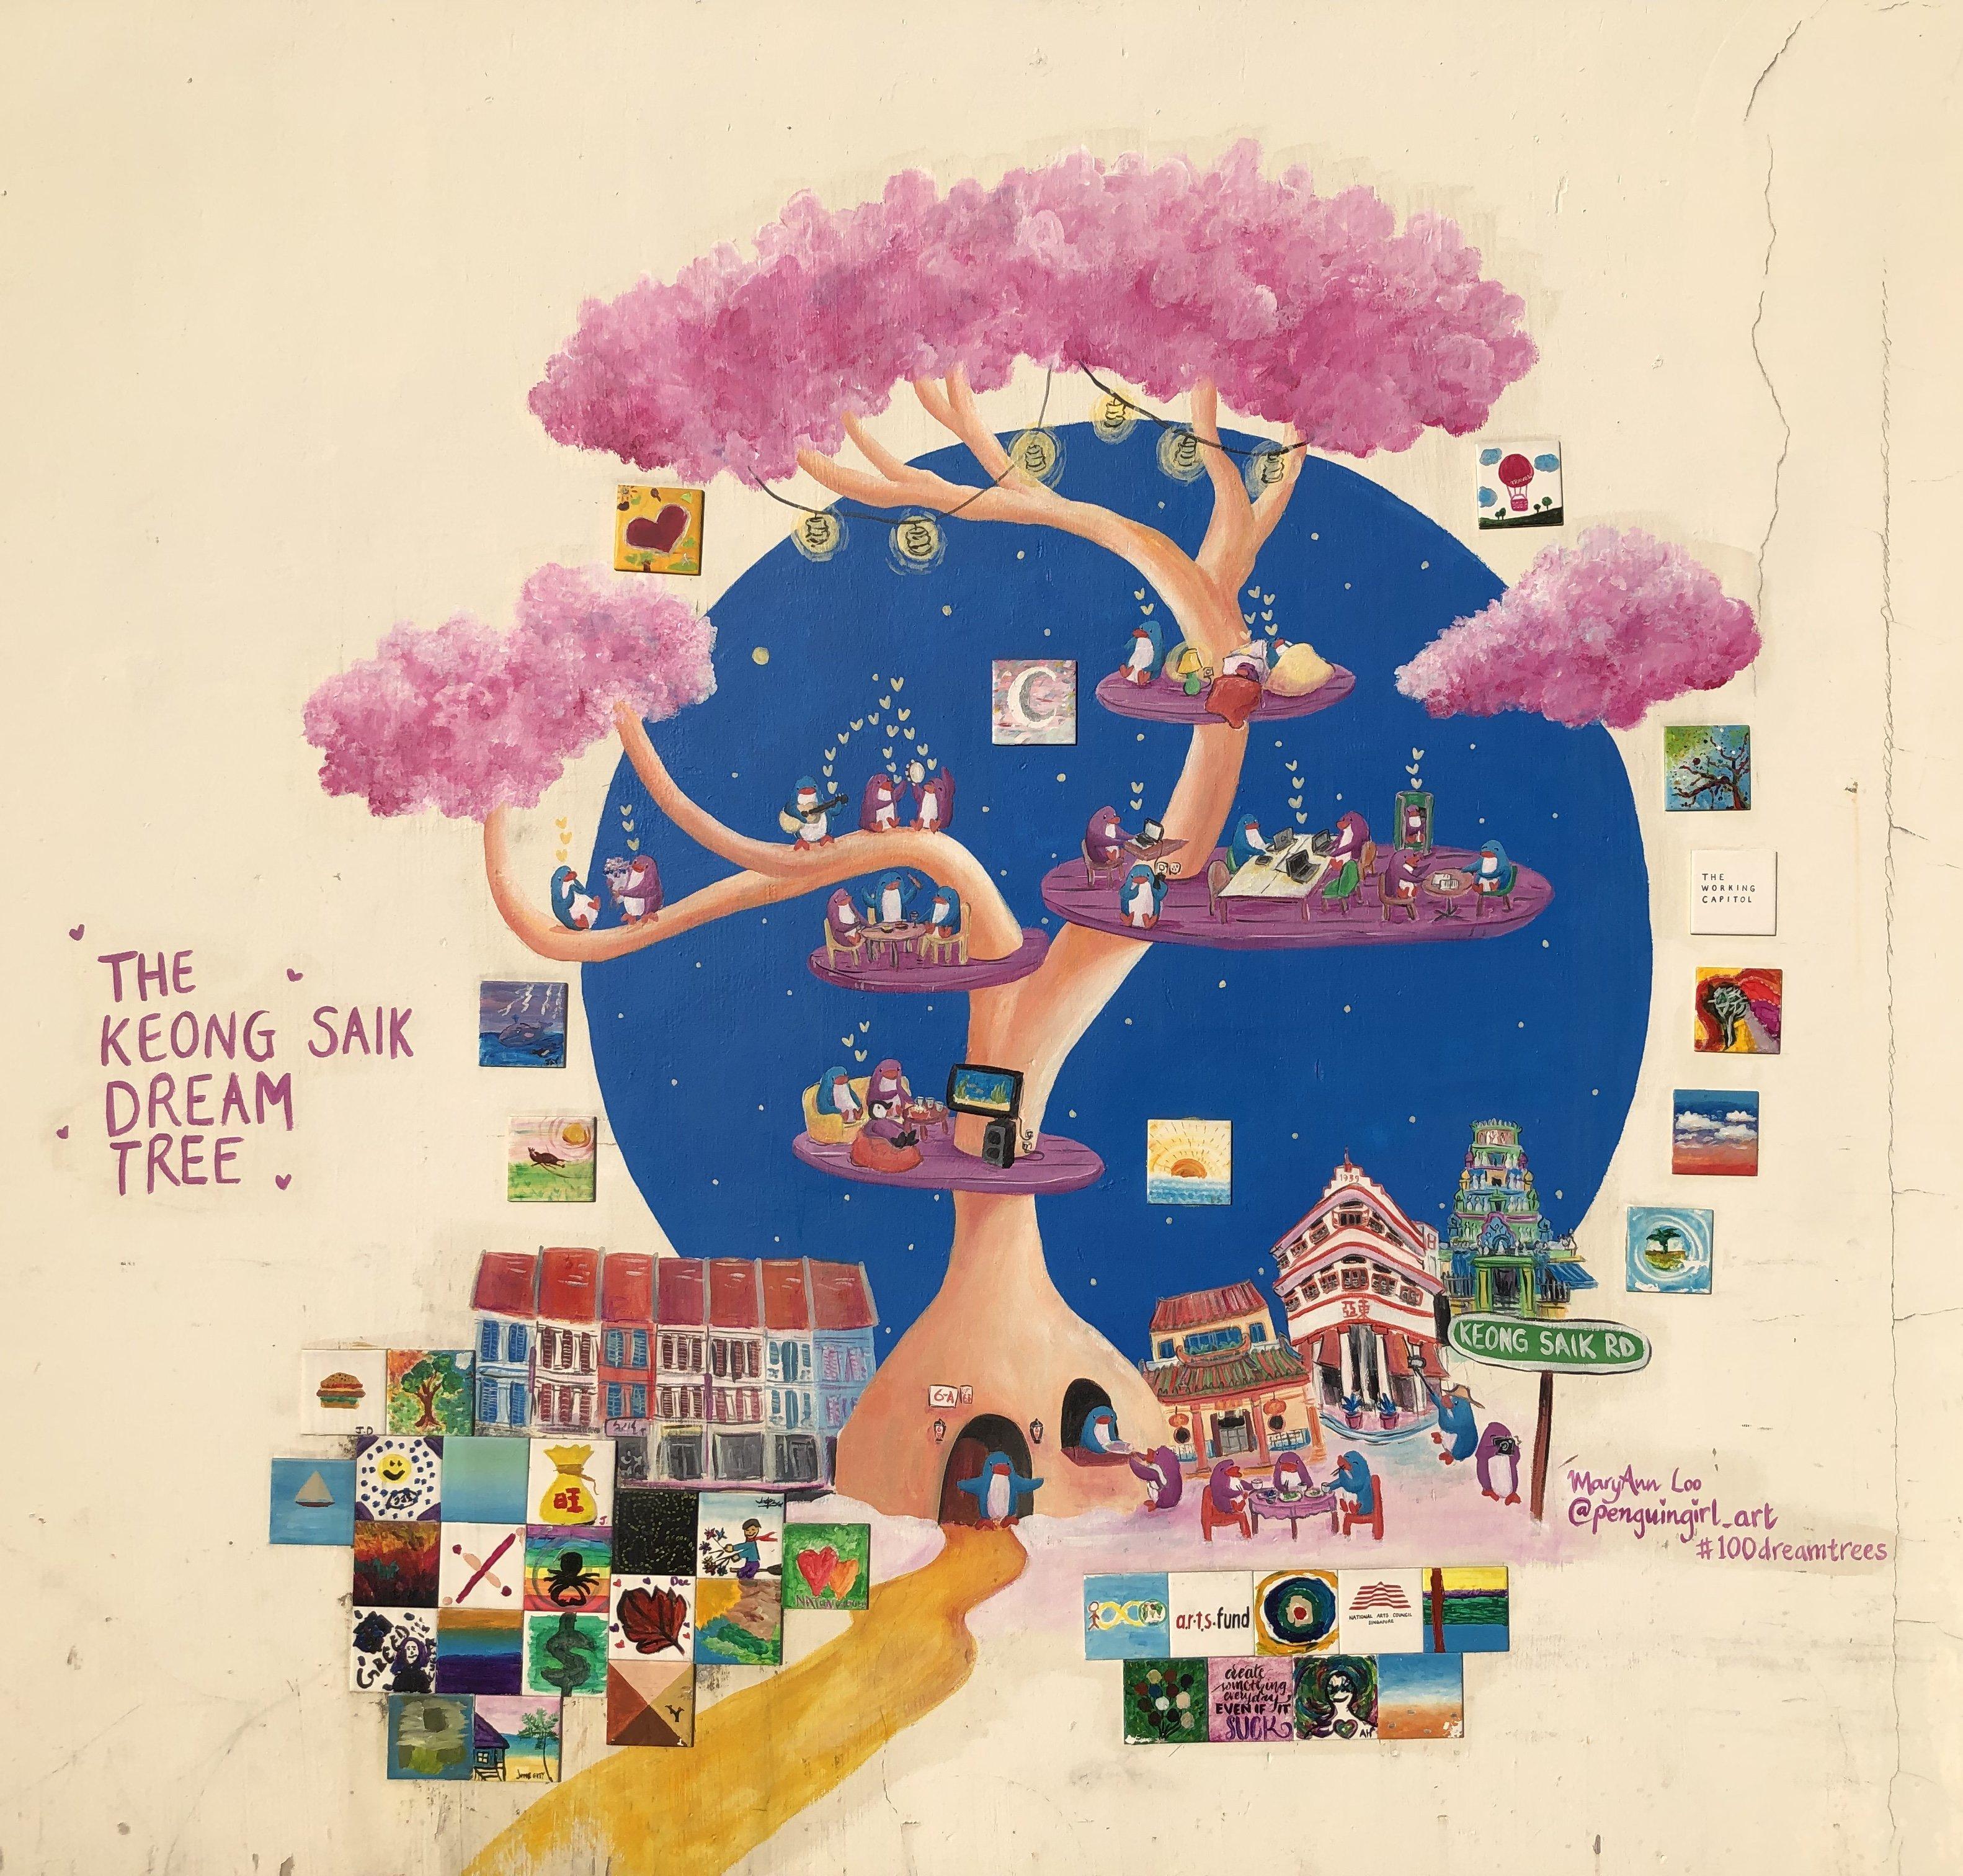 Keong Saik Dream Tree